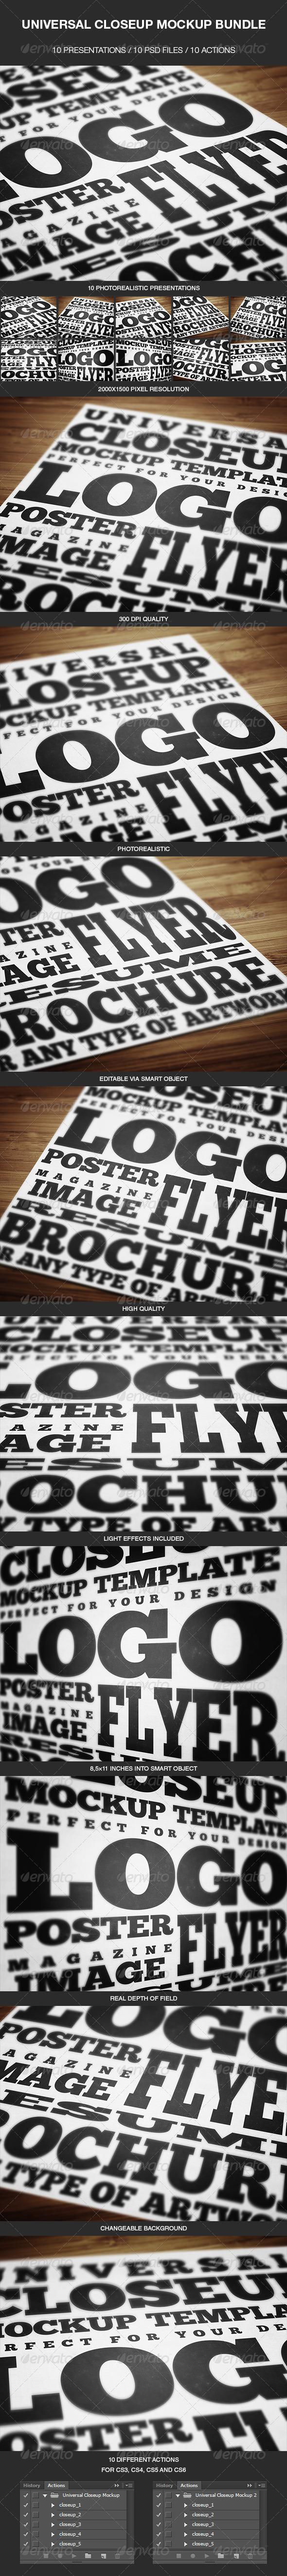 Universal Closeup Mockup Bundle - Print Product Mock-Ups